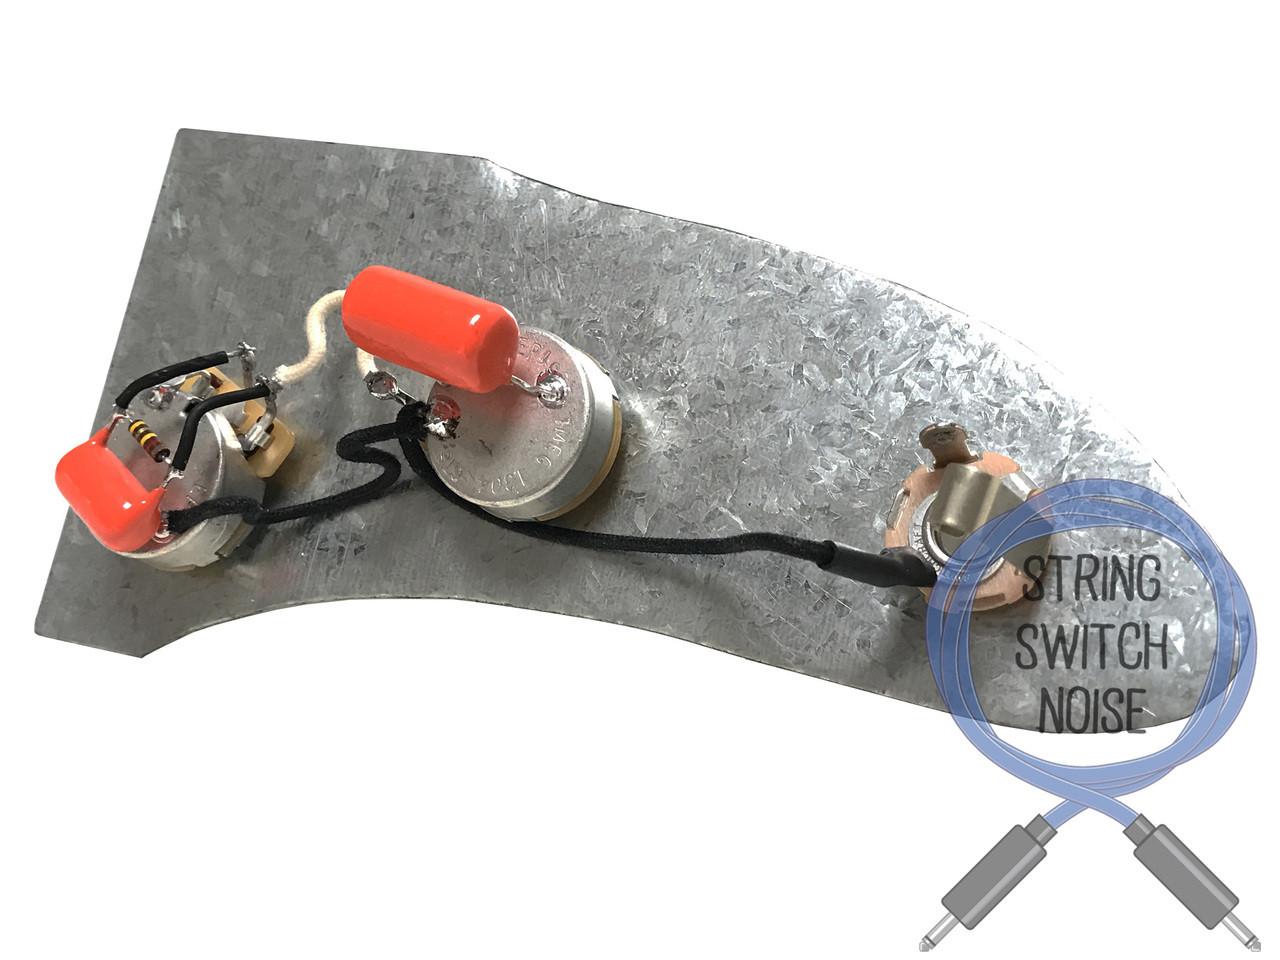 (Fender) Jazzmaster Wiring Harness, Treble Bleed, Upgrade